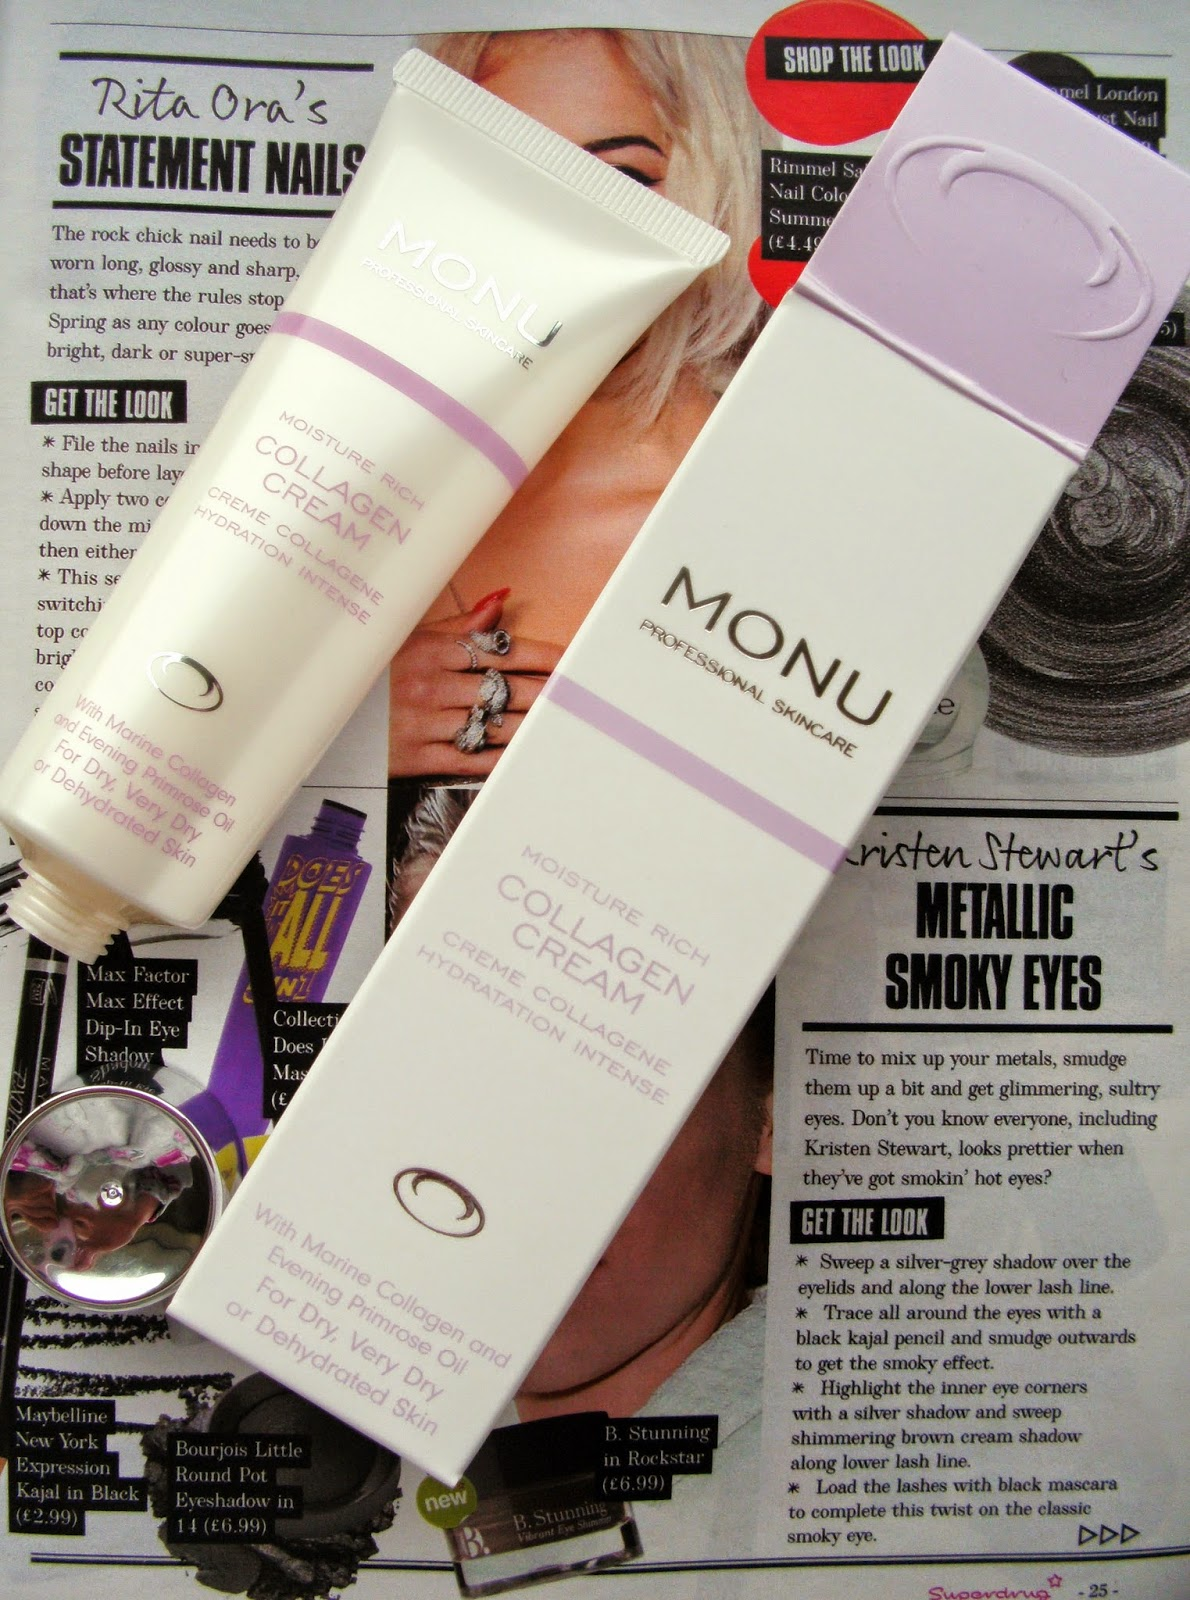 Monu Professional Skincare Moisture Rich Collagen Cream